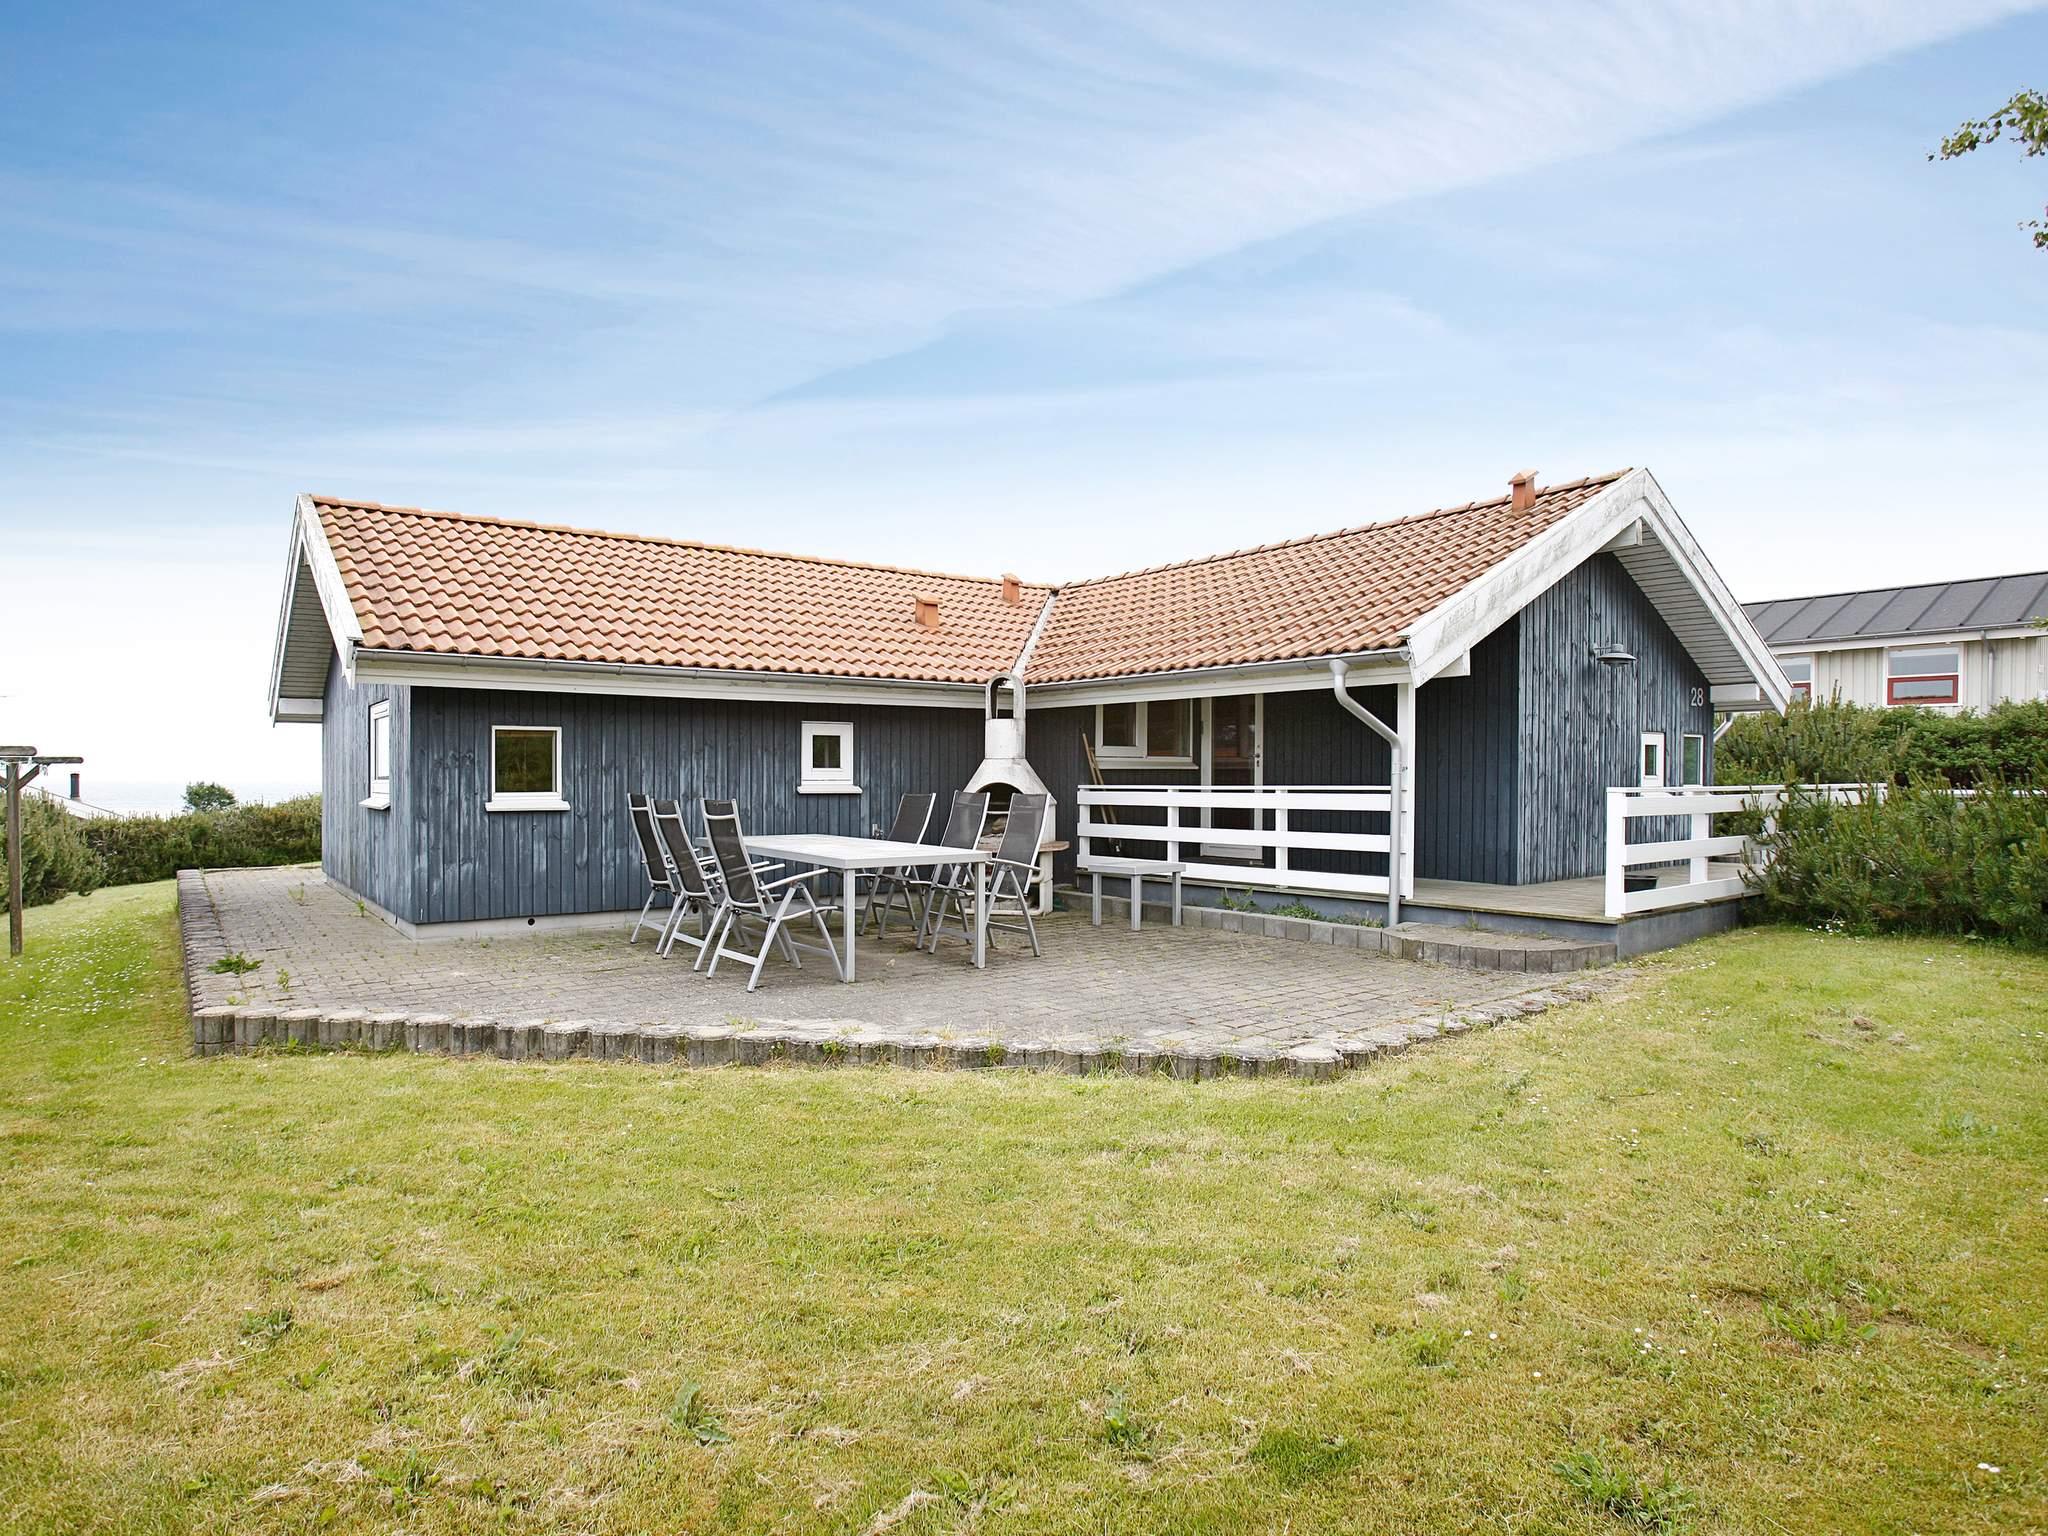 Ferienhaus Øster Hurup (814466), Øster Hurup, , Ostjütland, Dänemark, Bild 11